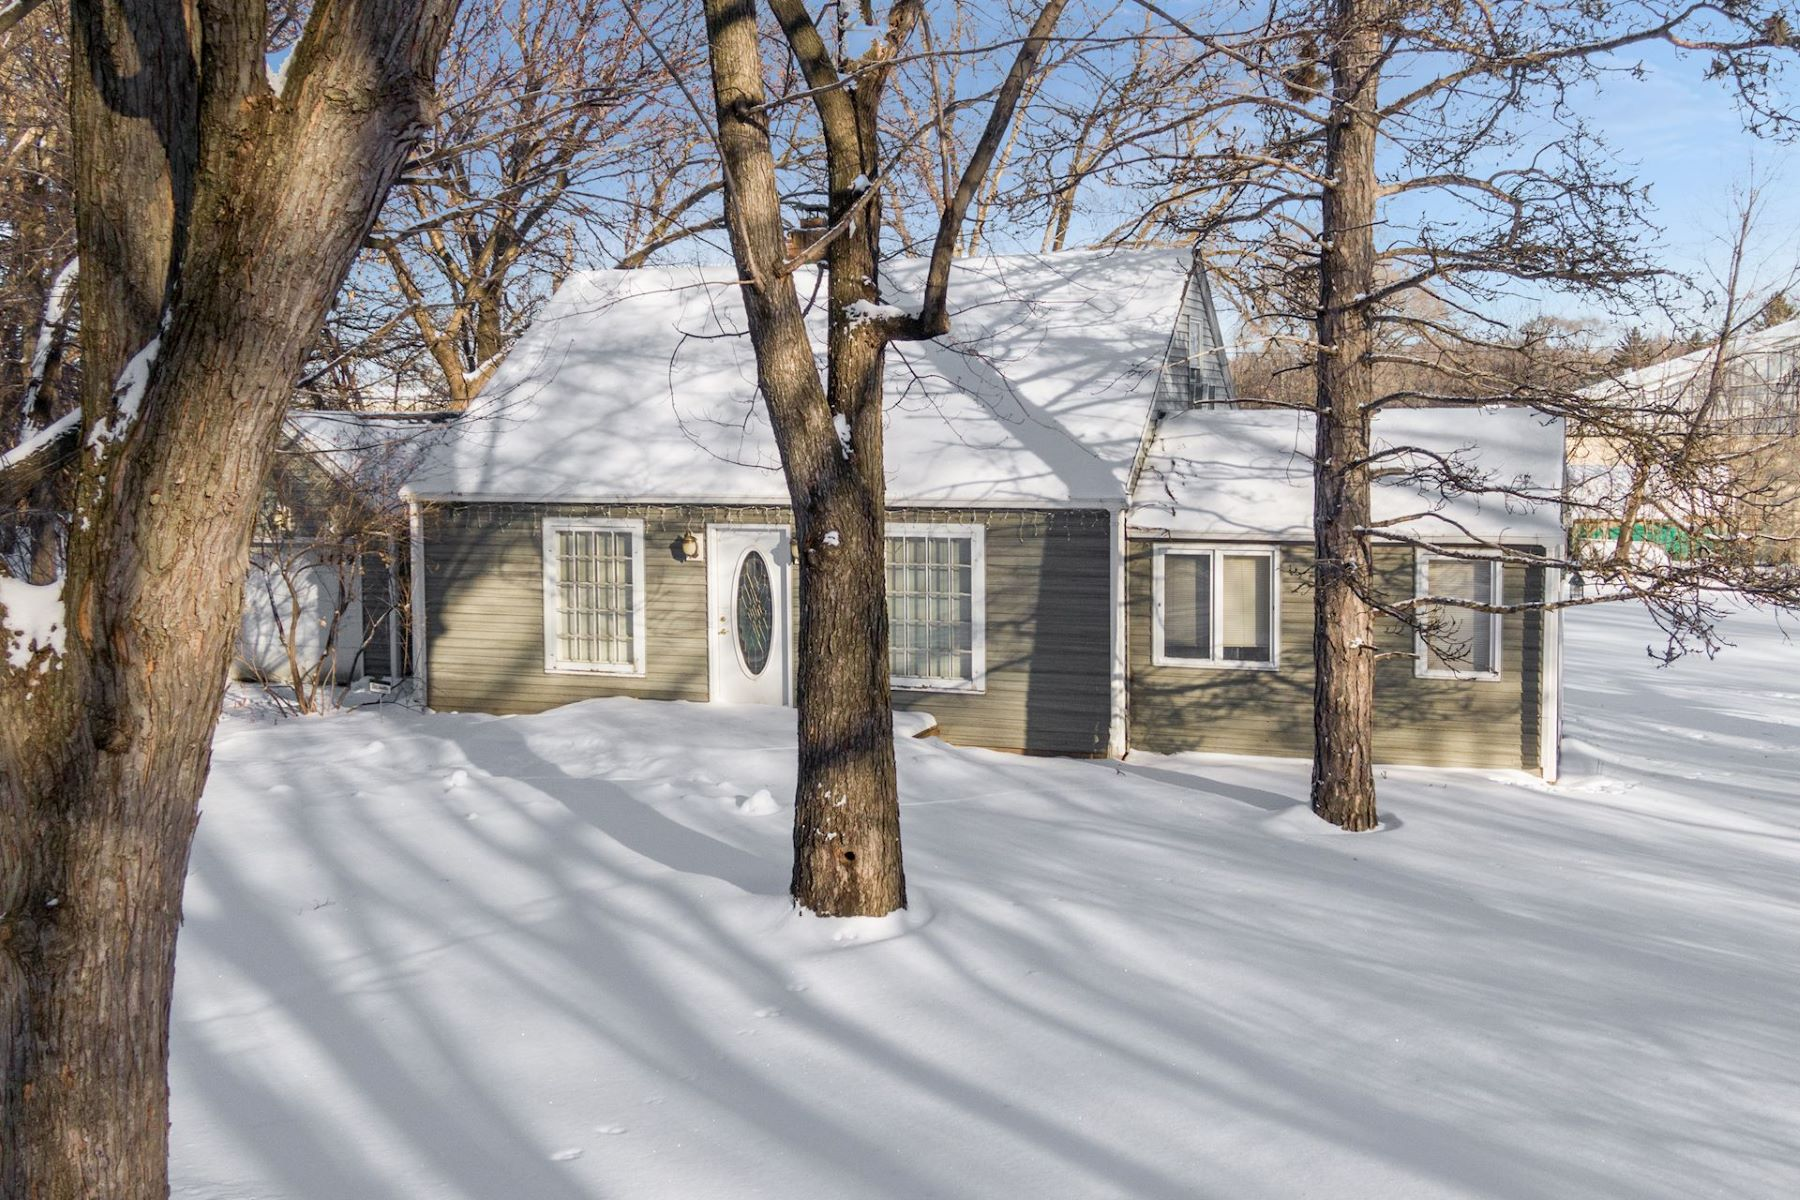 Single Family Homes für Verkauf beim Build Your Dream Home in one of Deephaven's Most Convenient Locations 3429 Lowell Street, Deephaven, Minnesota 55391 Vereinigte Staaten